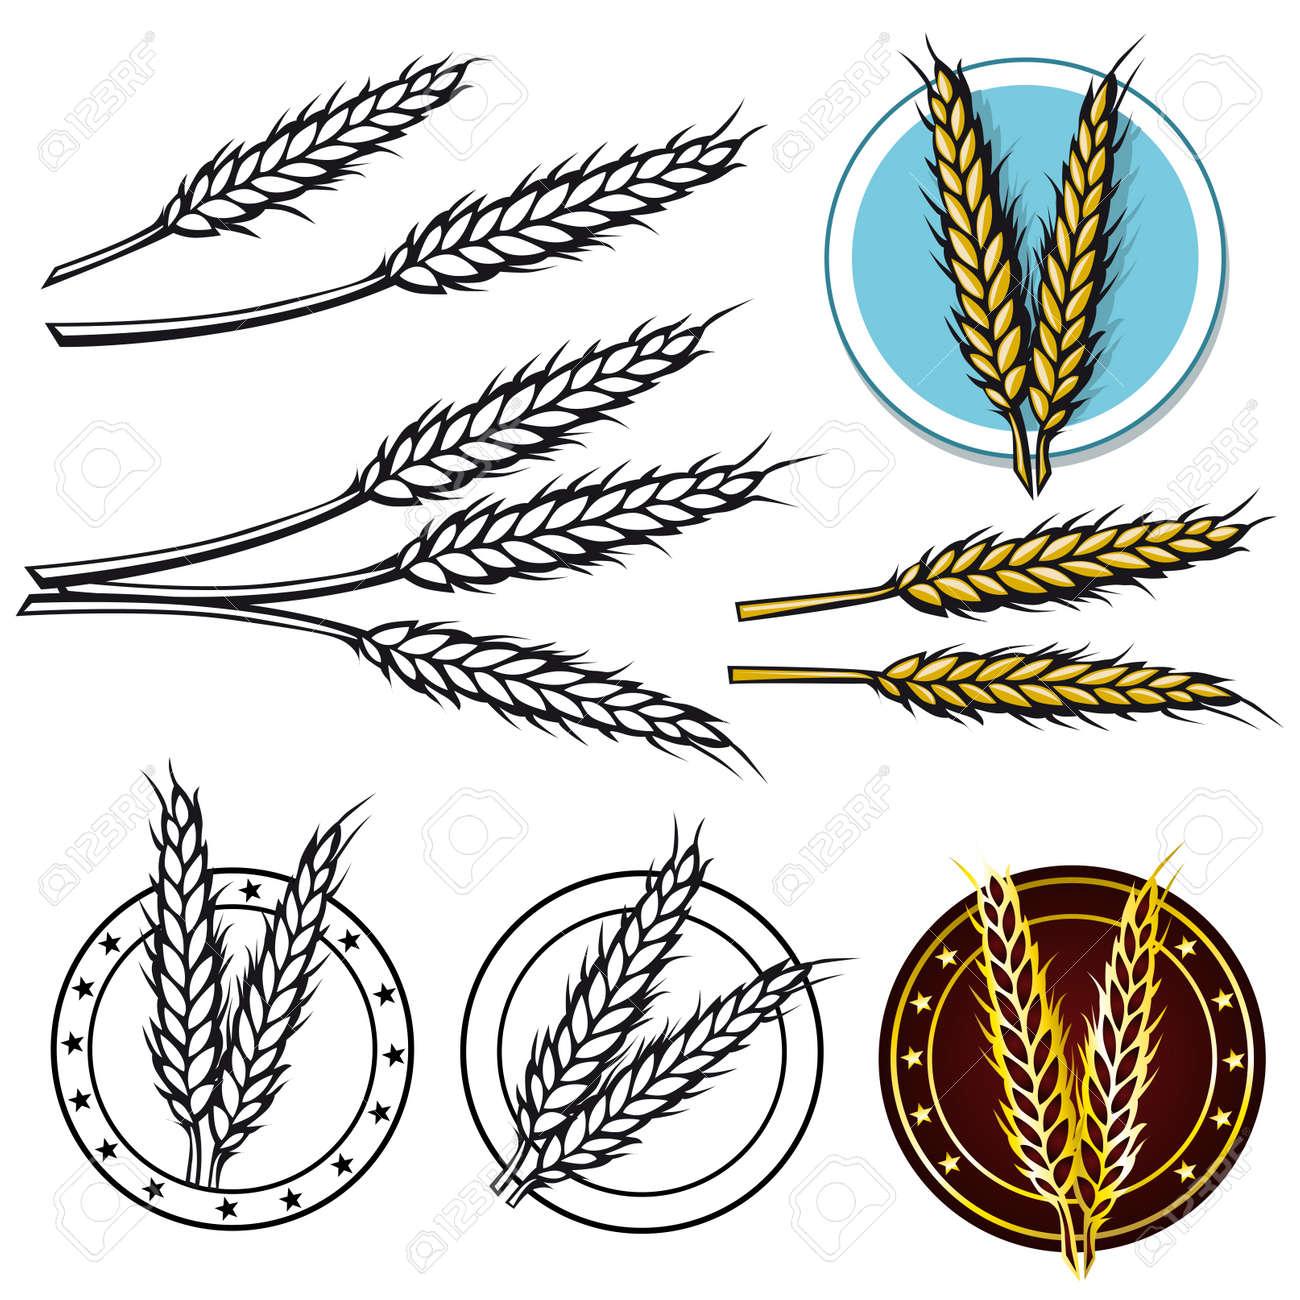 grain icon Stock Vector - 14092876